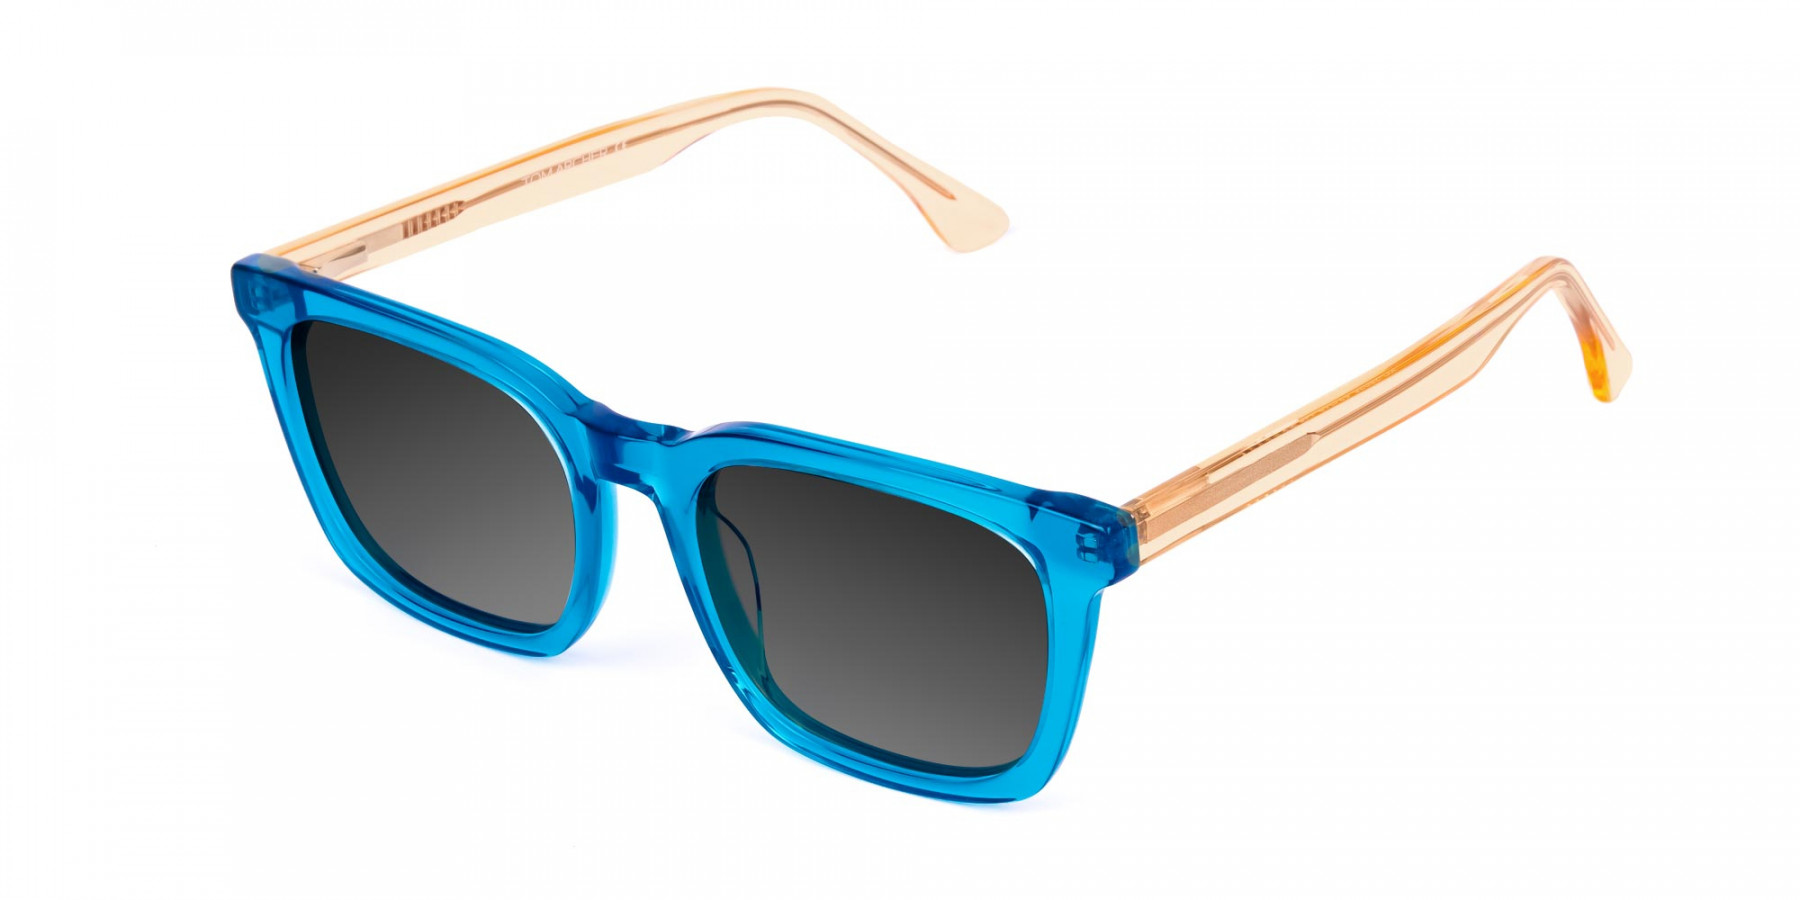 Blue-Wayfarer-Sunglasses-with-Grey-Tint-3